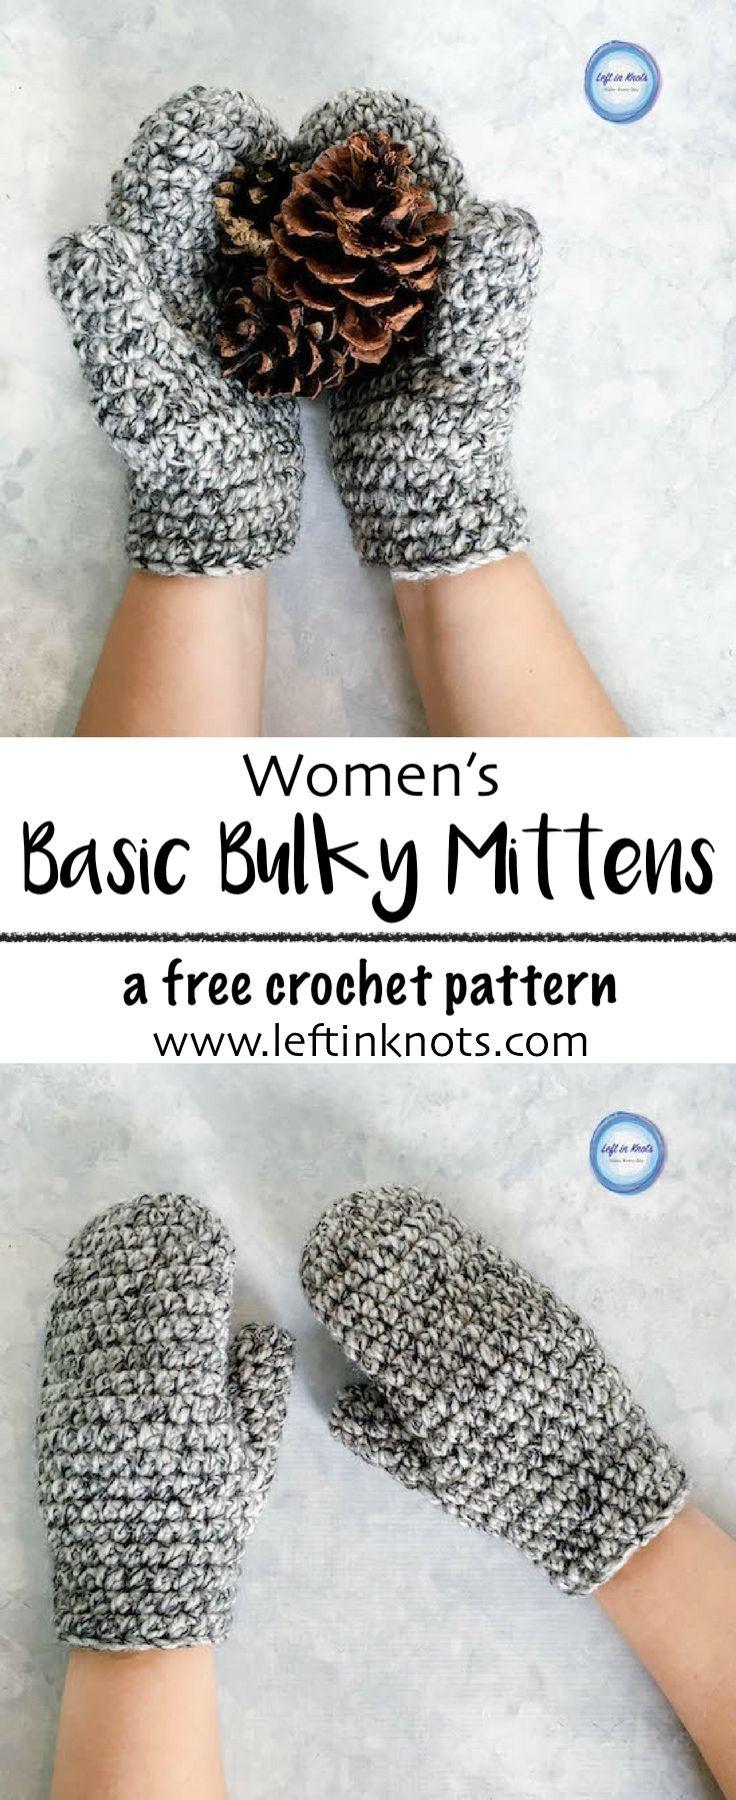 Women\'s Basic Bulky Mittens Crochet Pattern | Guantes, Tejido y Mitones